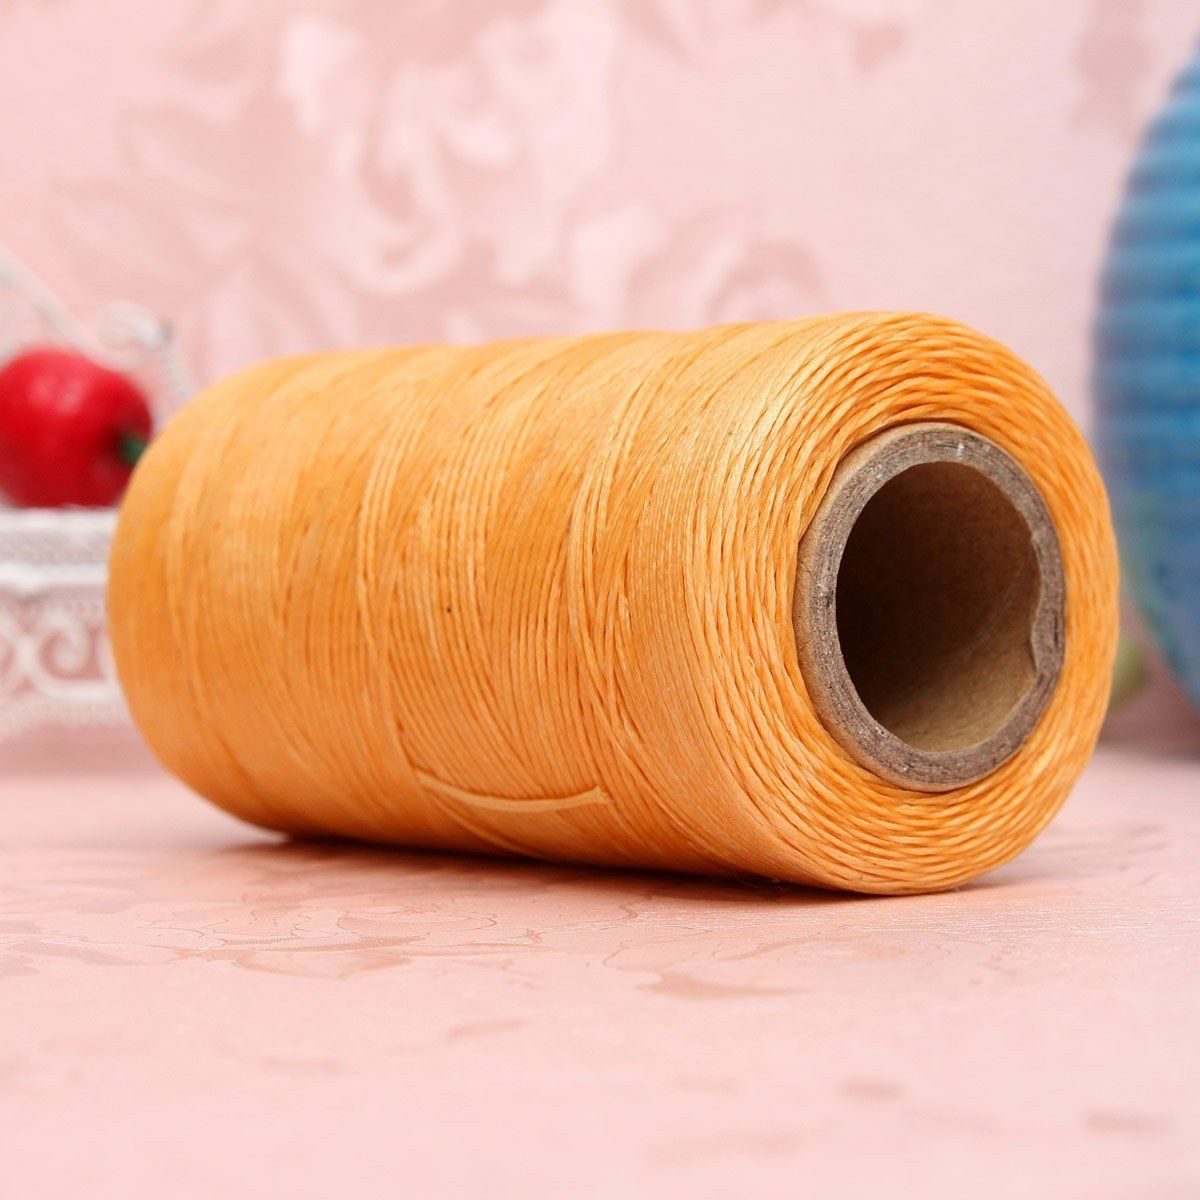 284Yard 150D Waxed Thread String Cord Sewing DIY Craft Leather Stitching Beige